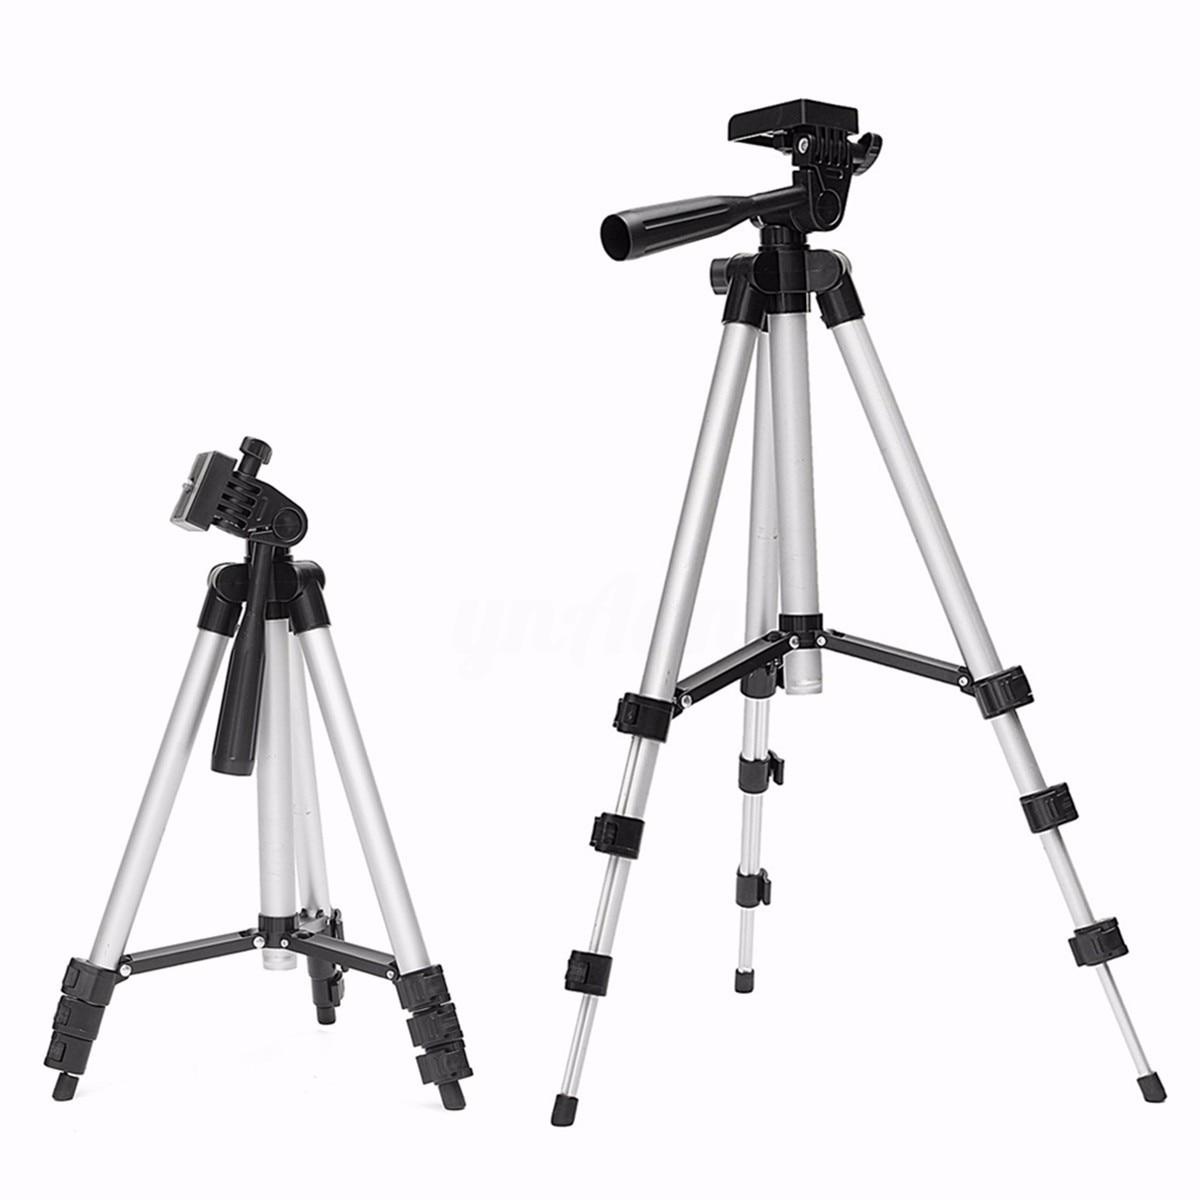 35-105cm Lightweight Aluminum Mini Tripod 4 Sections Universal Camera Tripod Camera Stand Photo Tripod Gorillapod Tripe